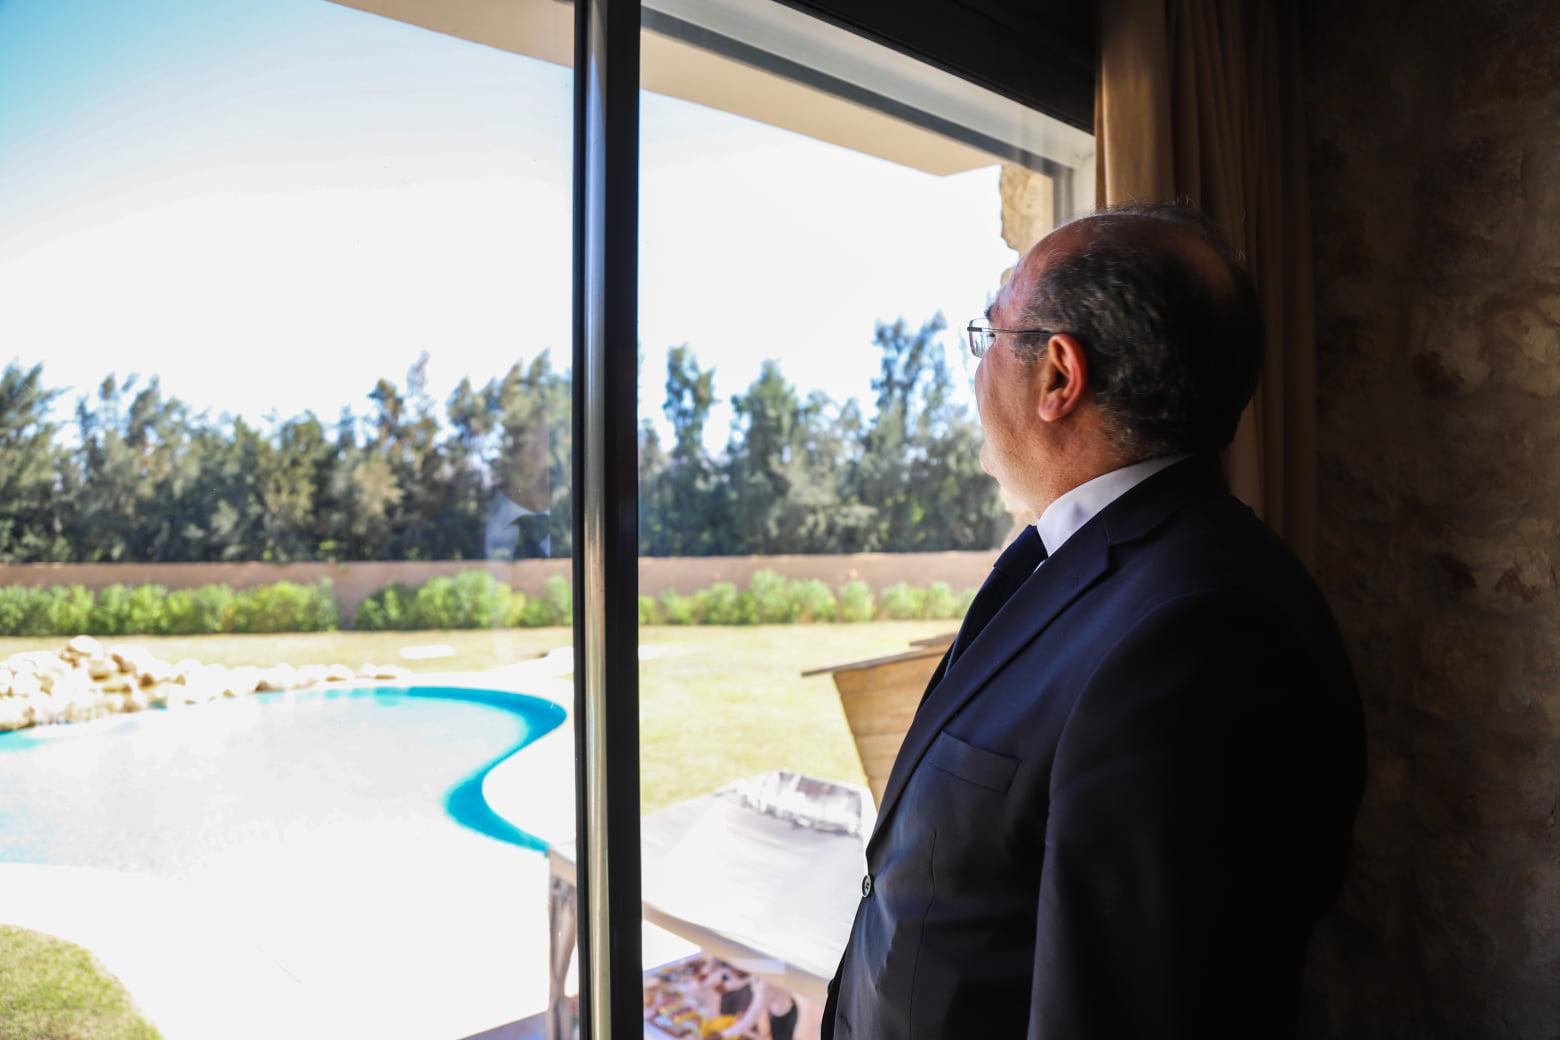 Tunisie : Habib Ammar inaugure une résidence rurale de luxe à Gafsa